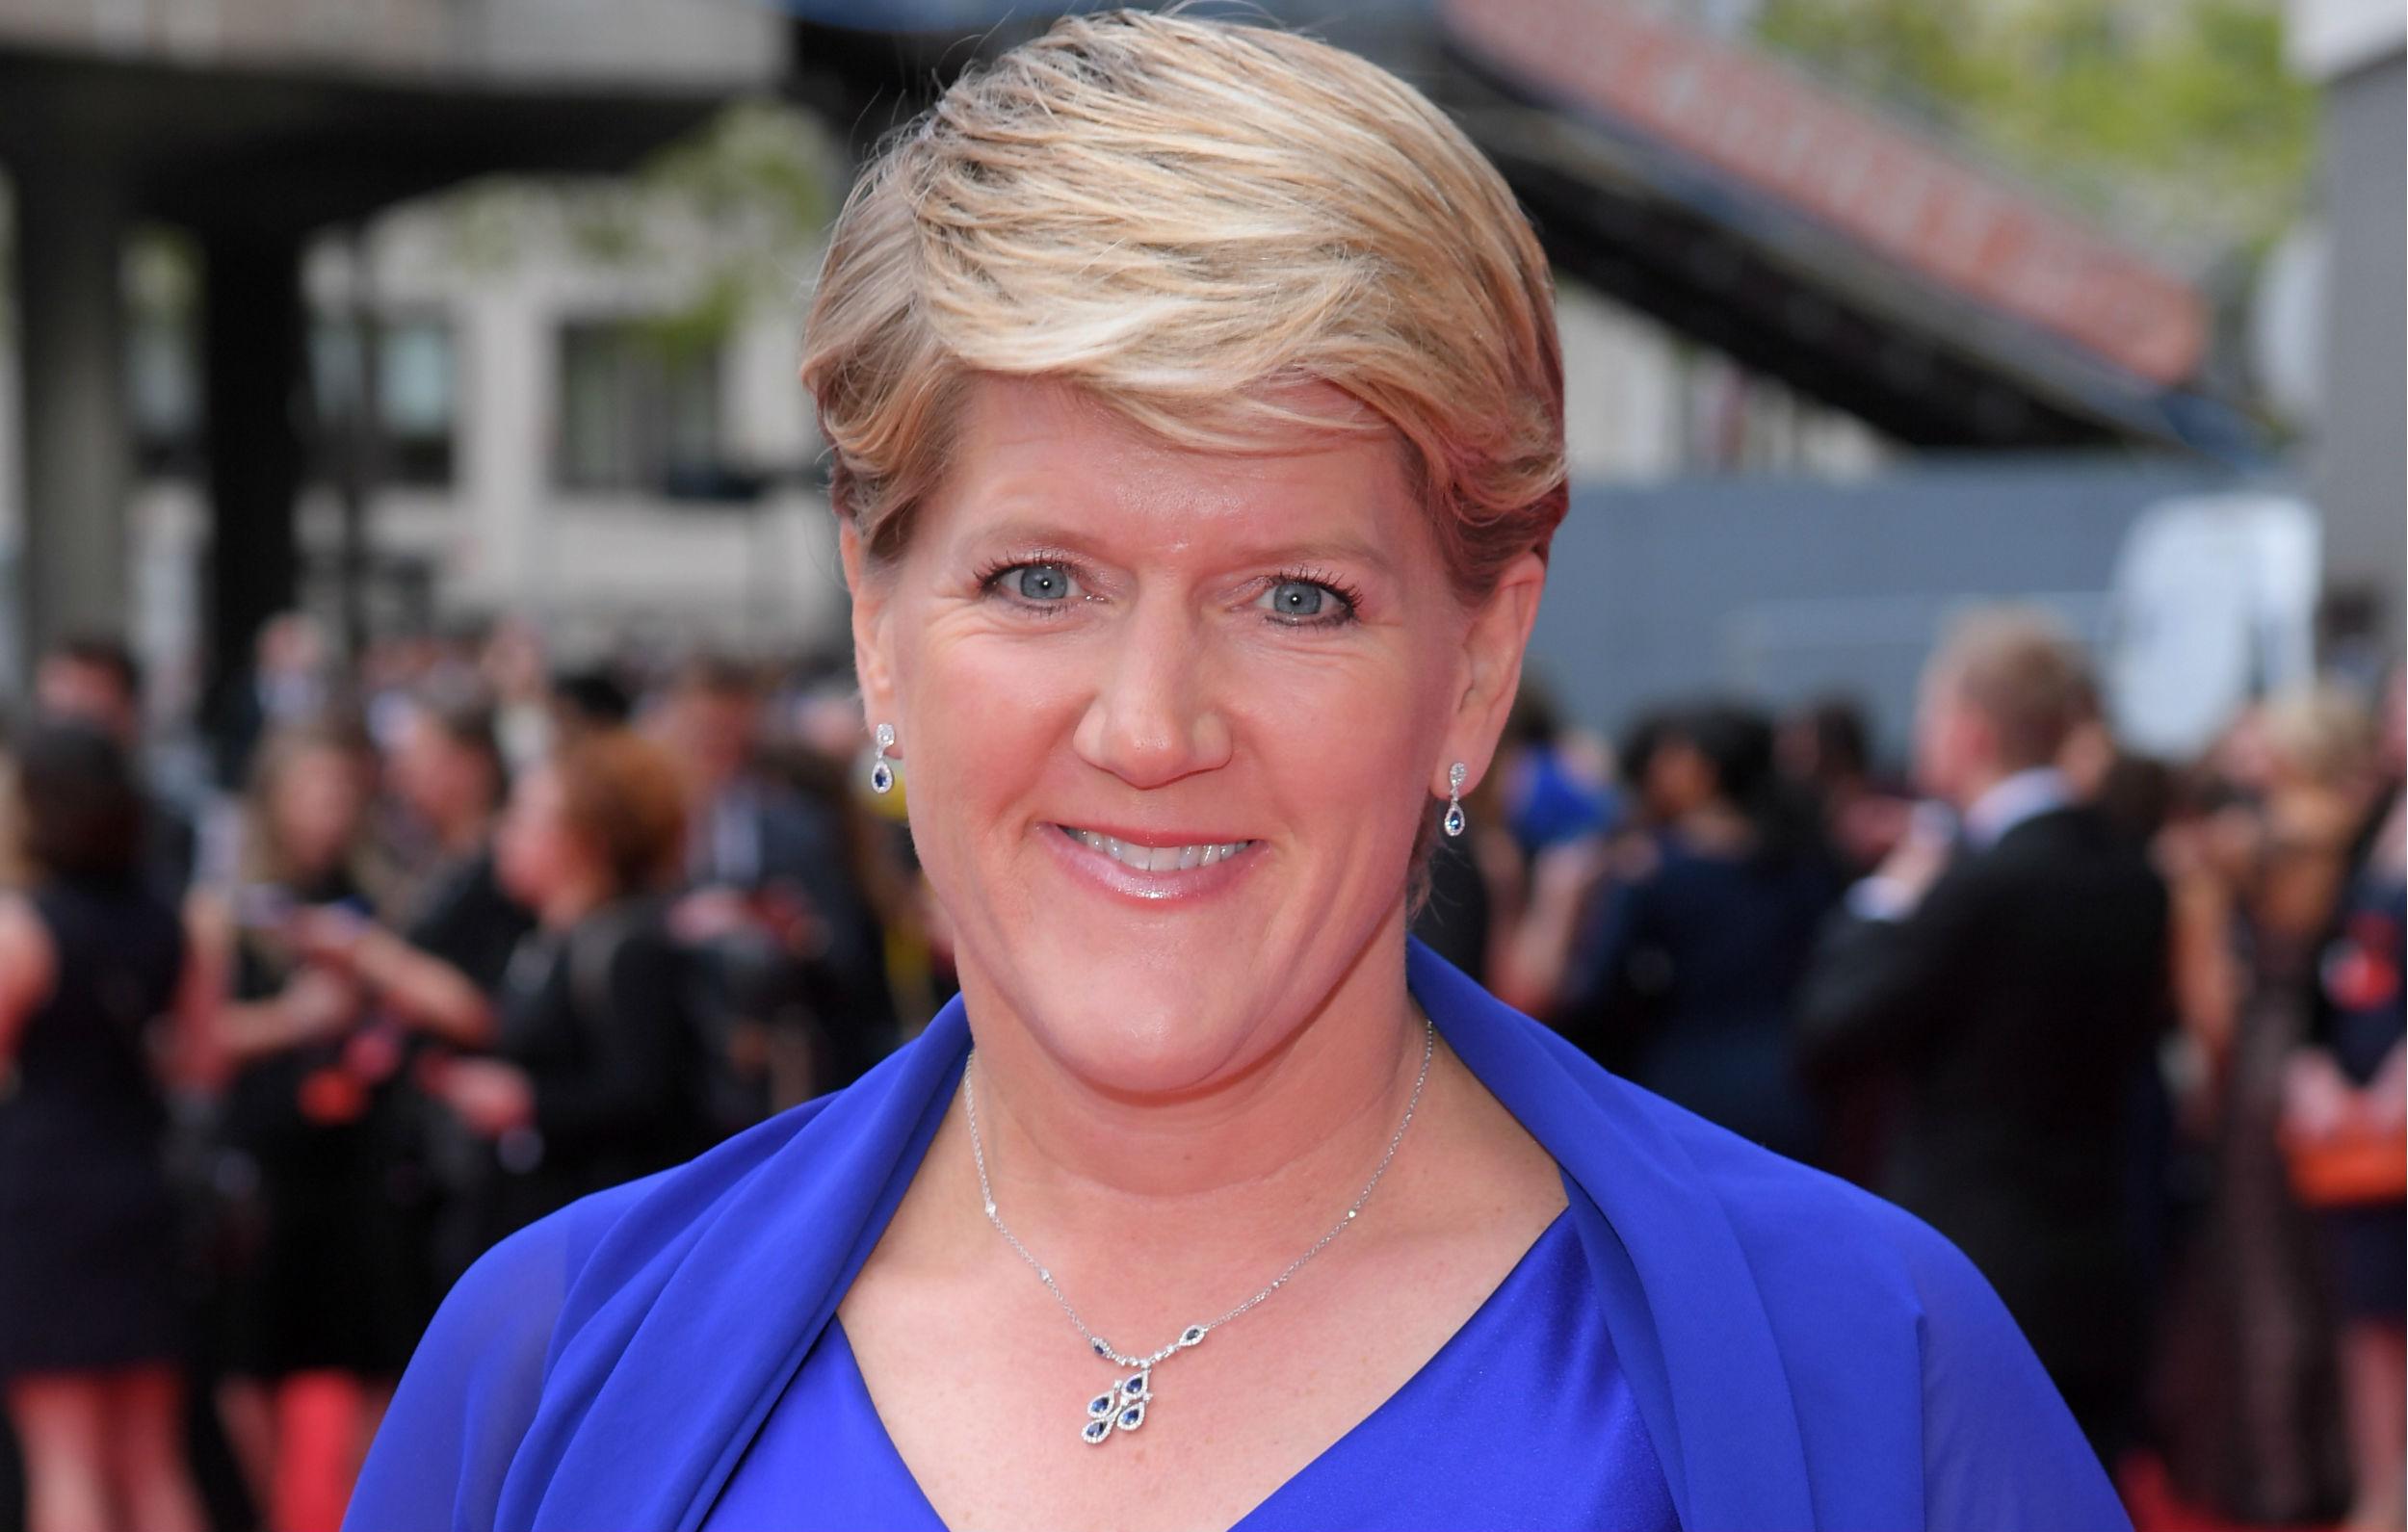 Clare Balding, BBC pay gap